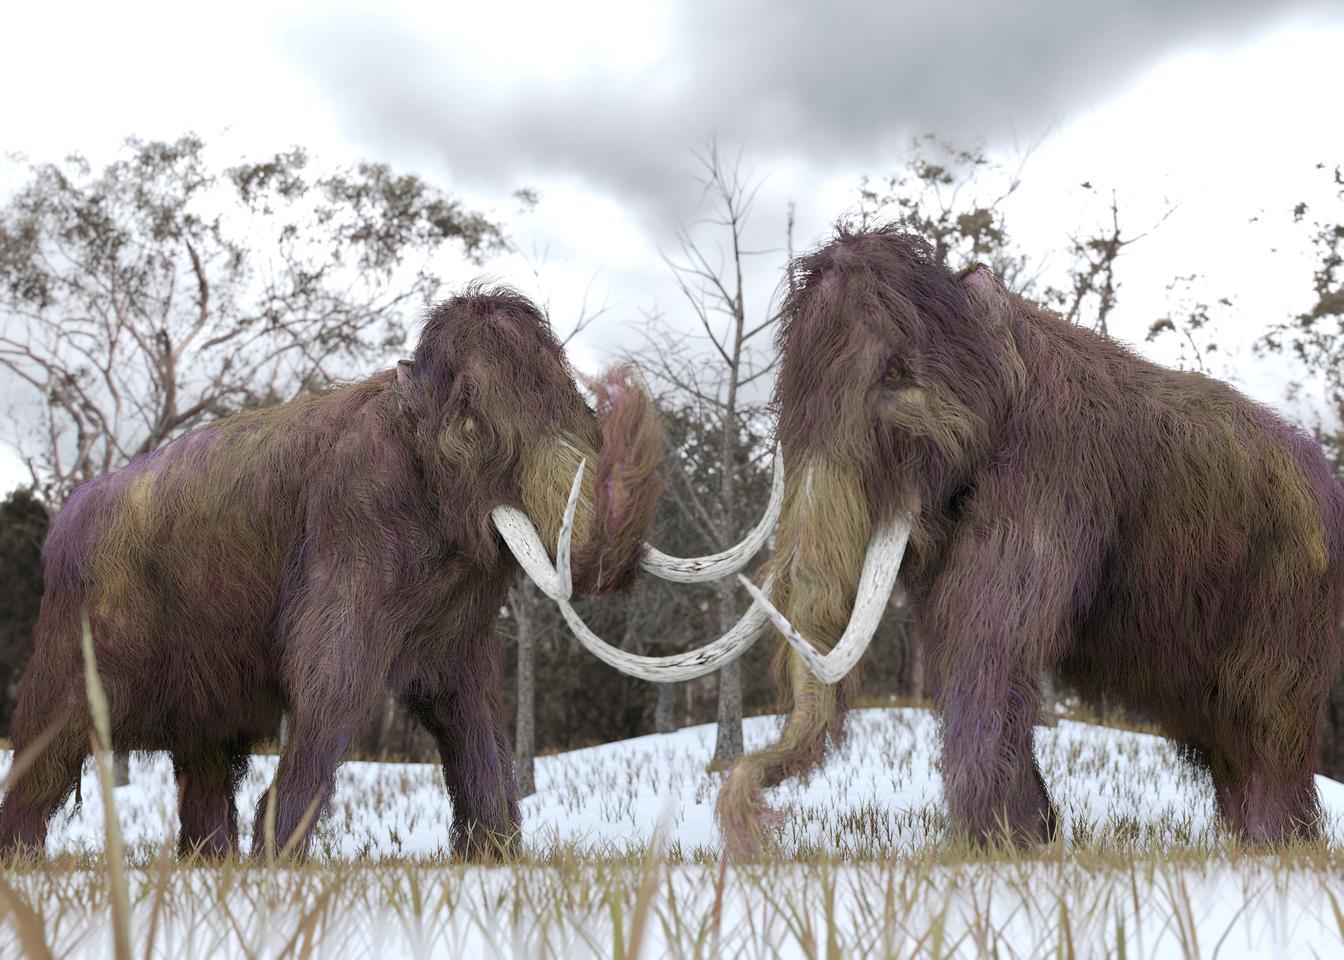 Resurrected Woolly Mammoth Genes Illustrate Genetic Decline